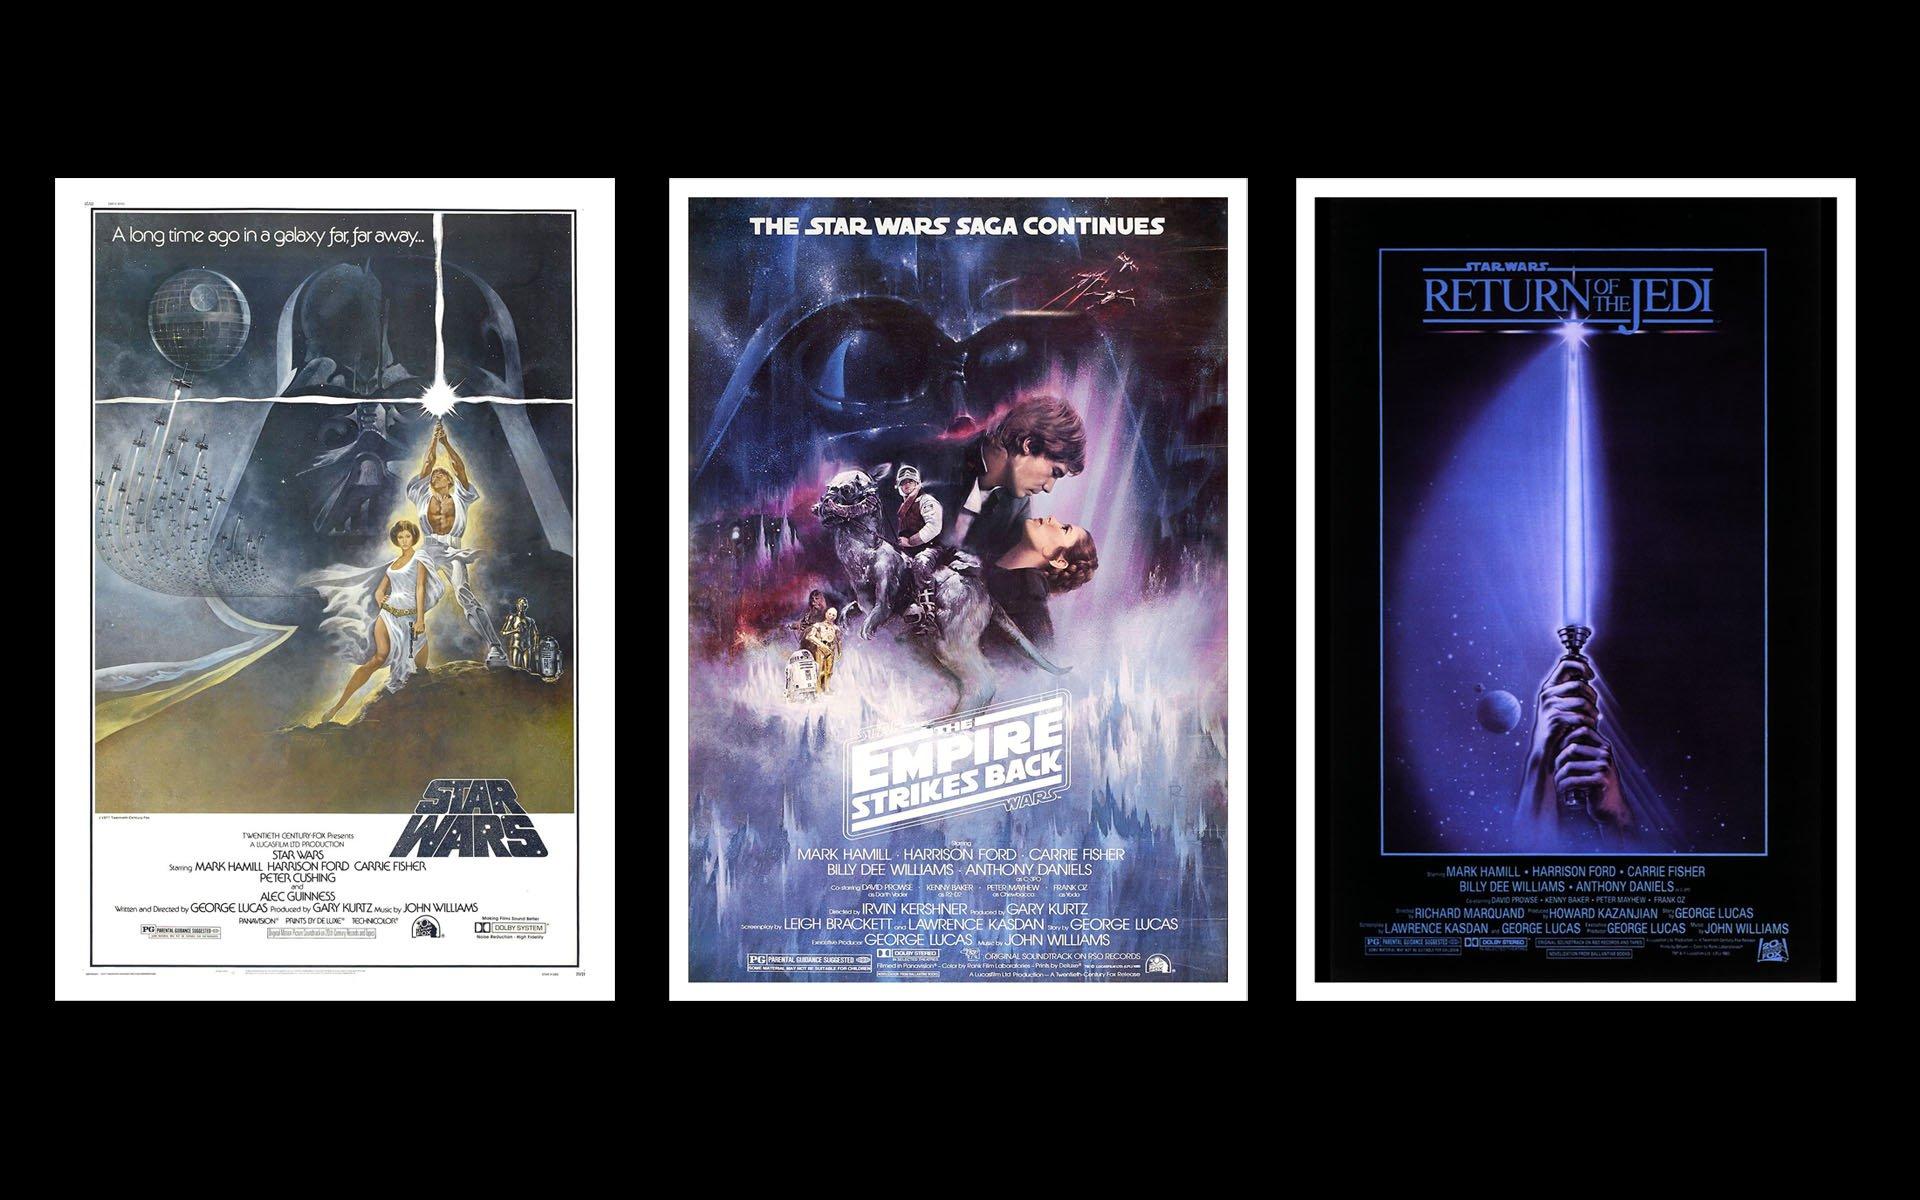 star wars movie posters HD Wallpaper   Movies TV 701931 1920x1200